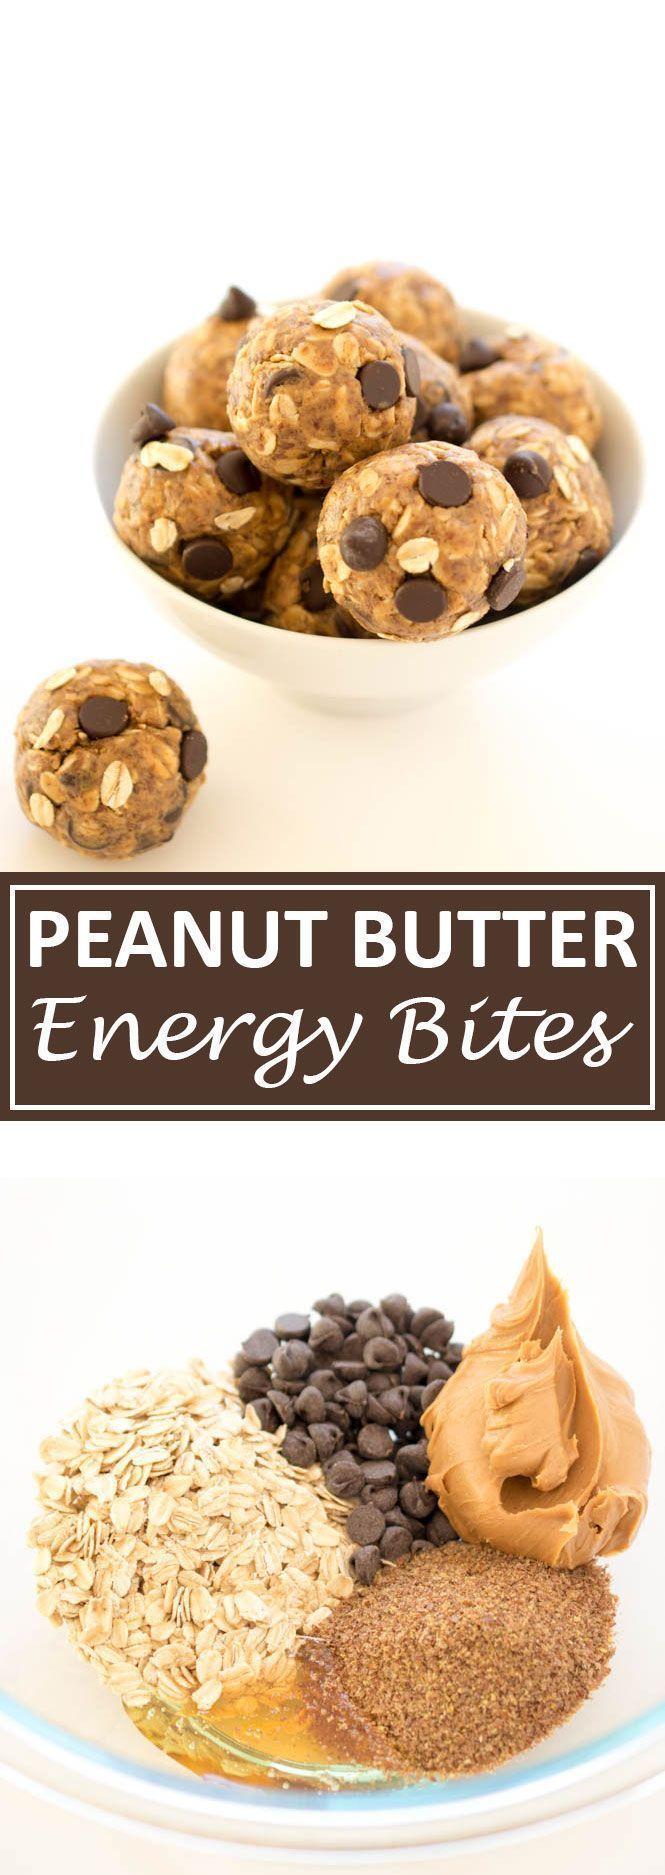 peanut butter nyttigt